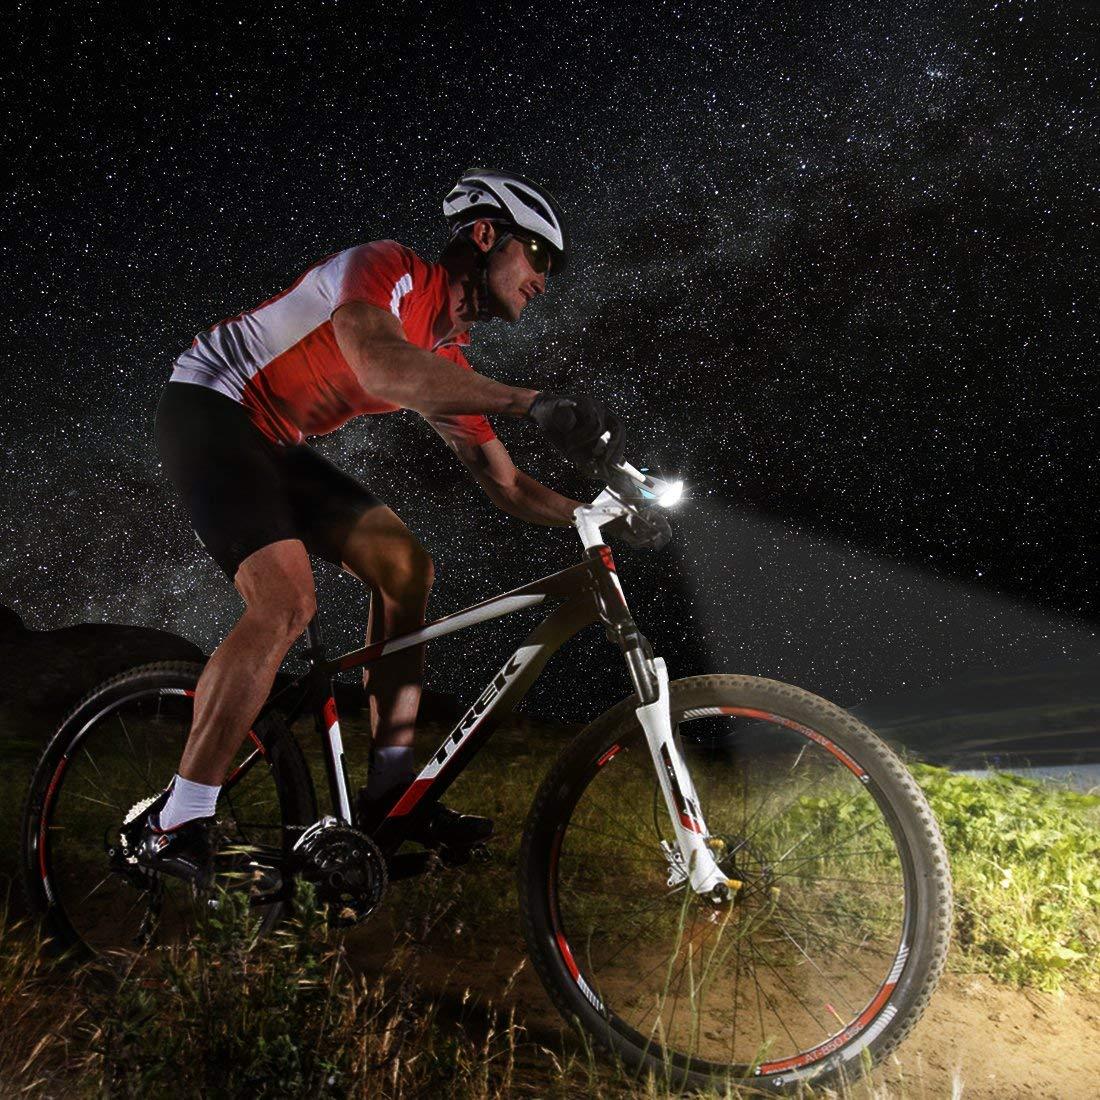 SLCSL Bicicleta luz lautes Bicicleta luz, wiederaufladbares ...